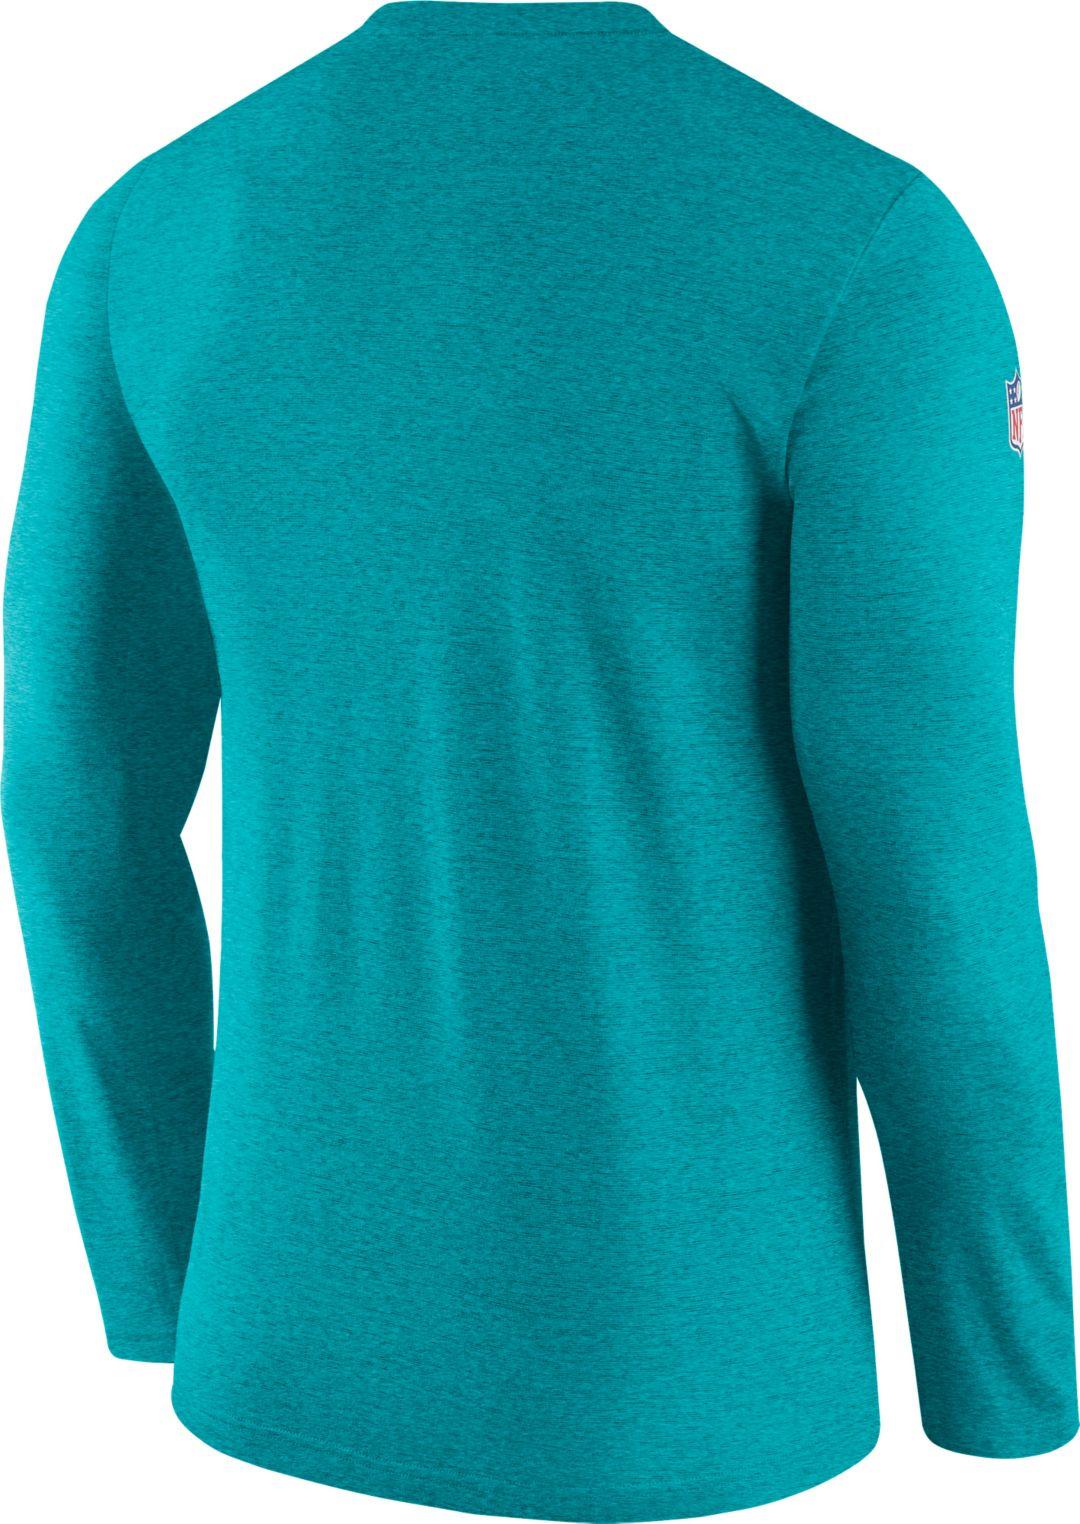 90744e86 Nike Men's Miami Dolphins Sideline Coach Performance Aqua Long Sleeve Shirt